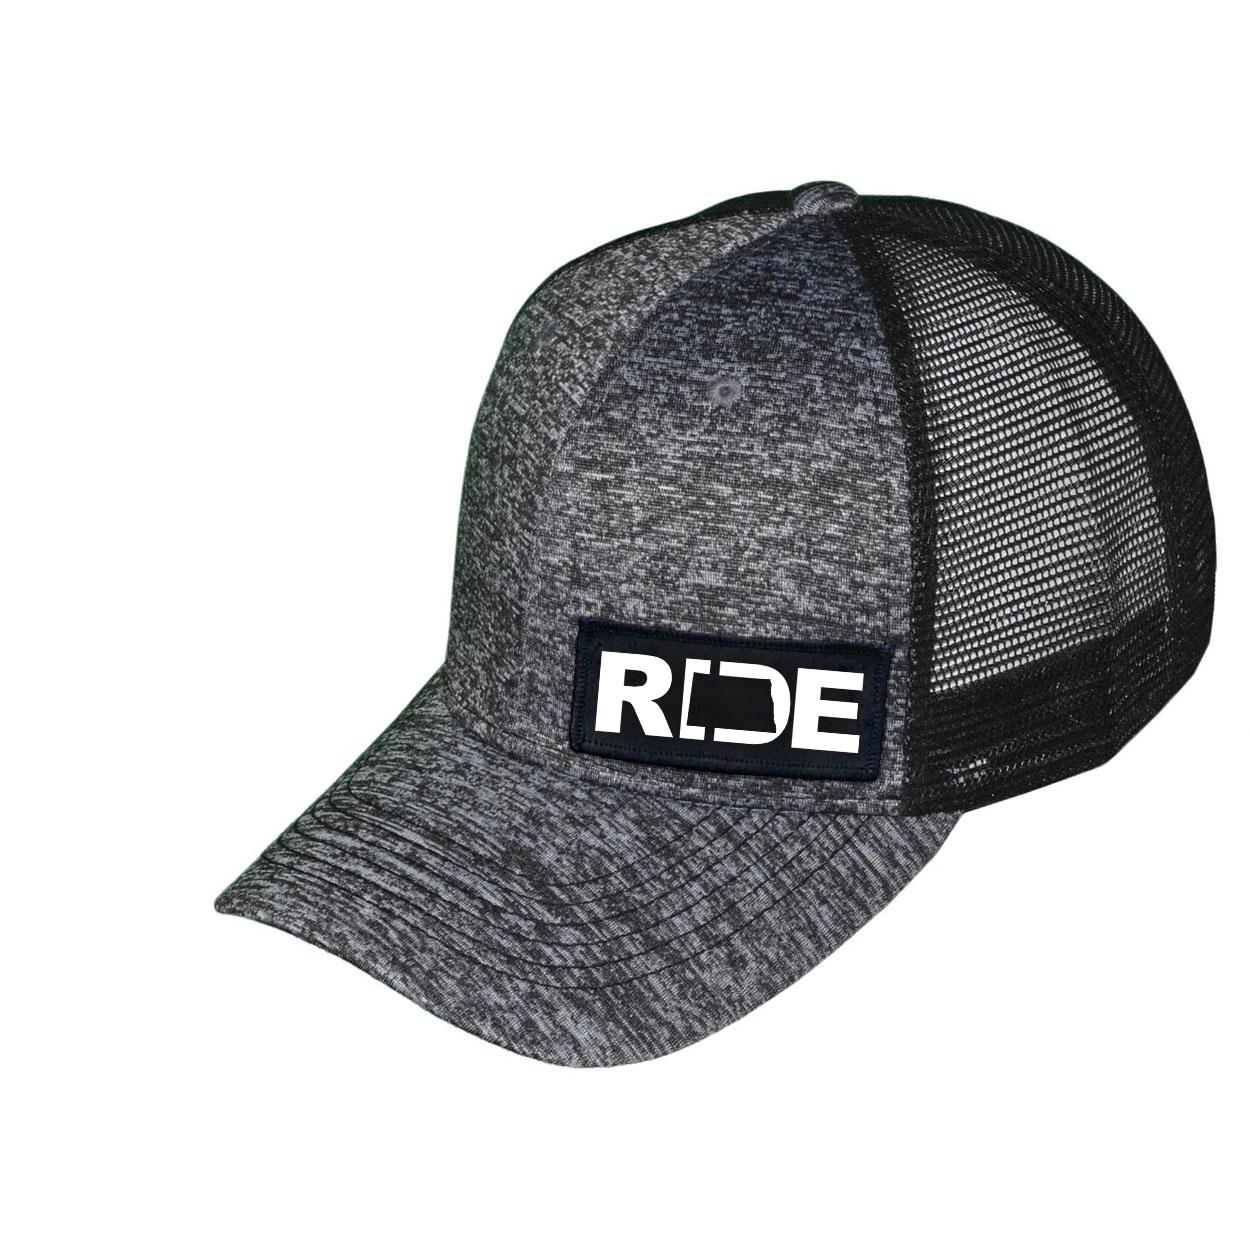 Ride North Dakota Night Out Woven Patch Melange Snapback Trucker Hat Gray/Black (White Logo)